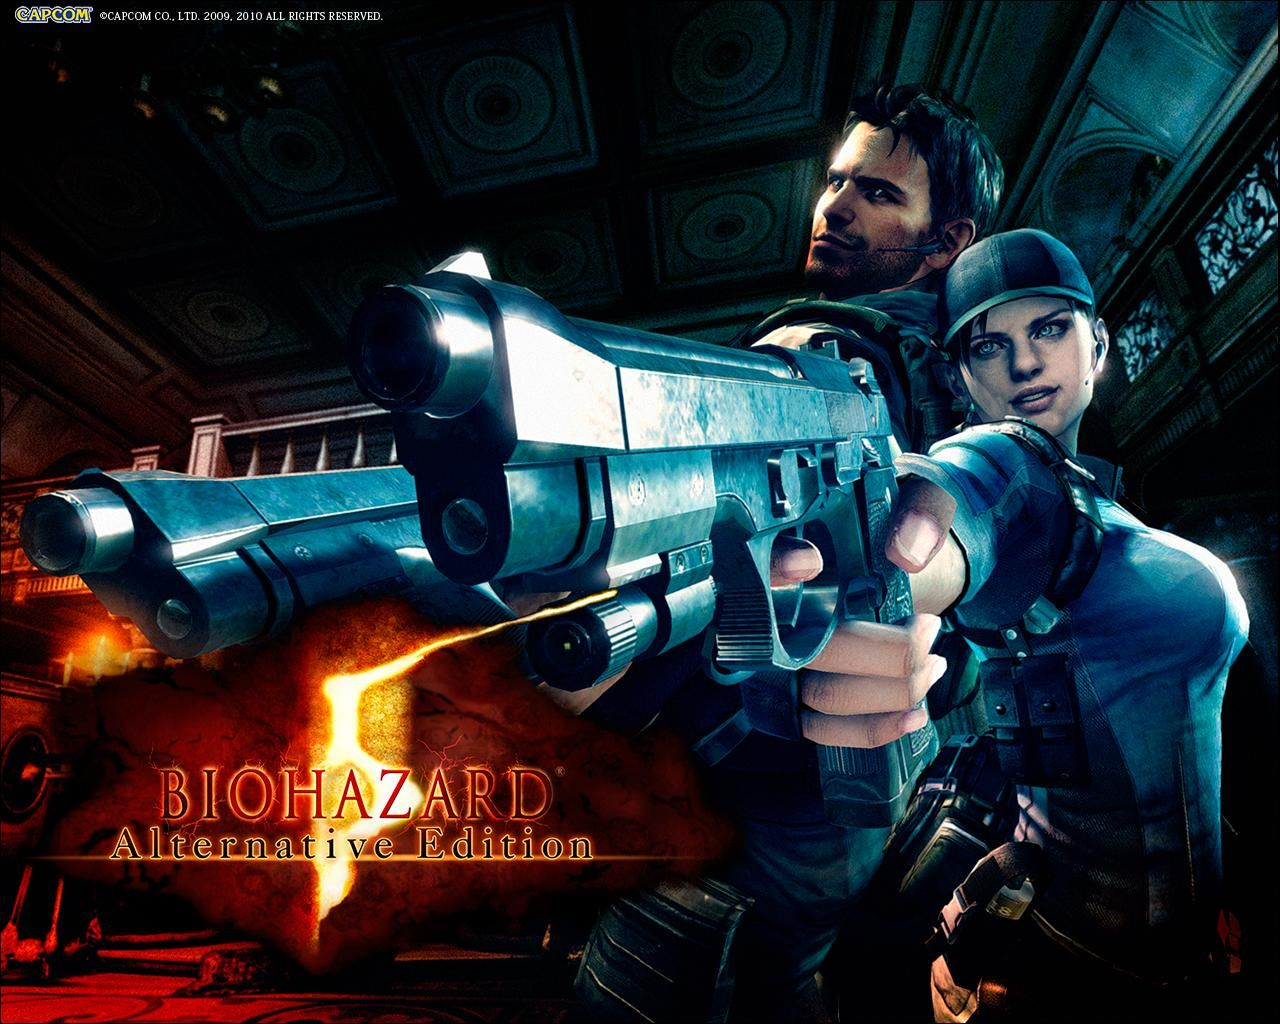 Resident Evil Hd Wallpapers Backgrounds Wallpaper